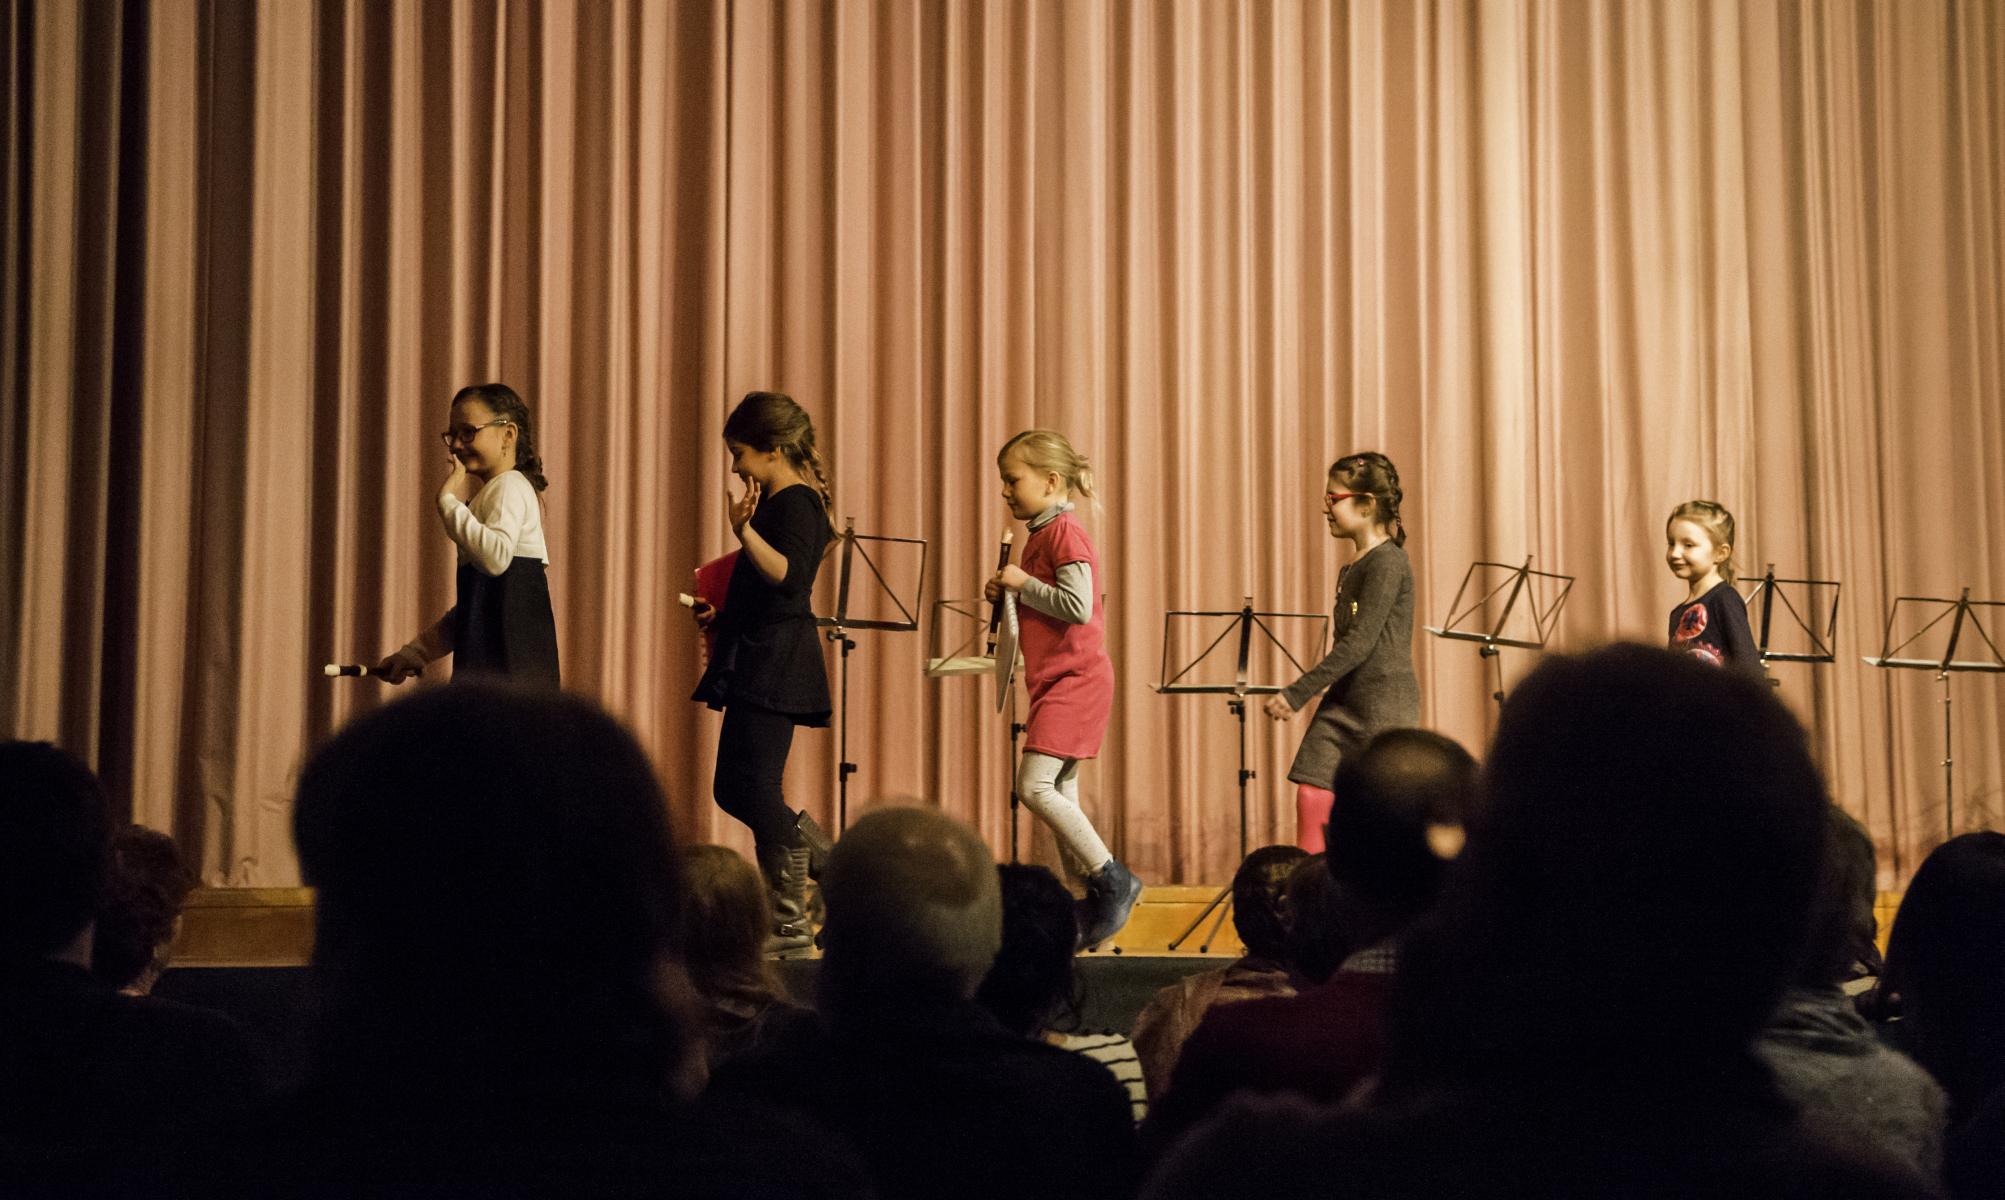 170211_concert_annuel17-007